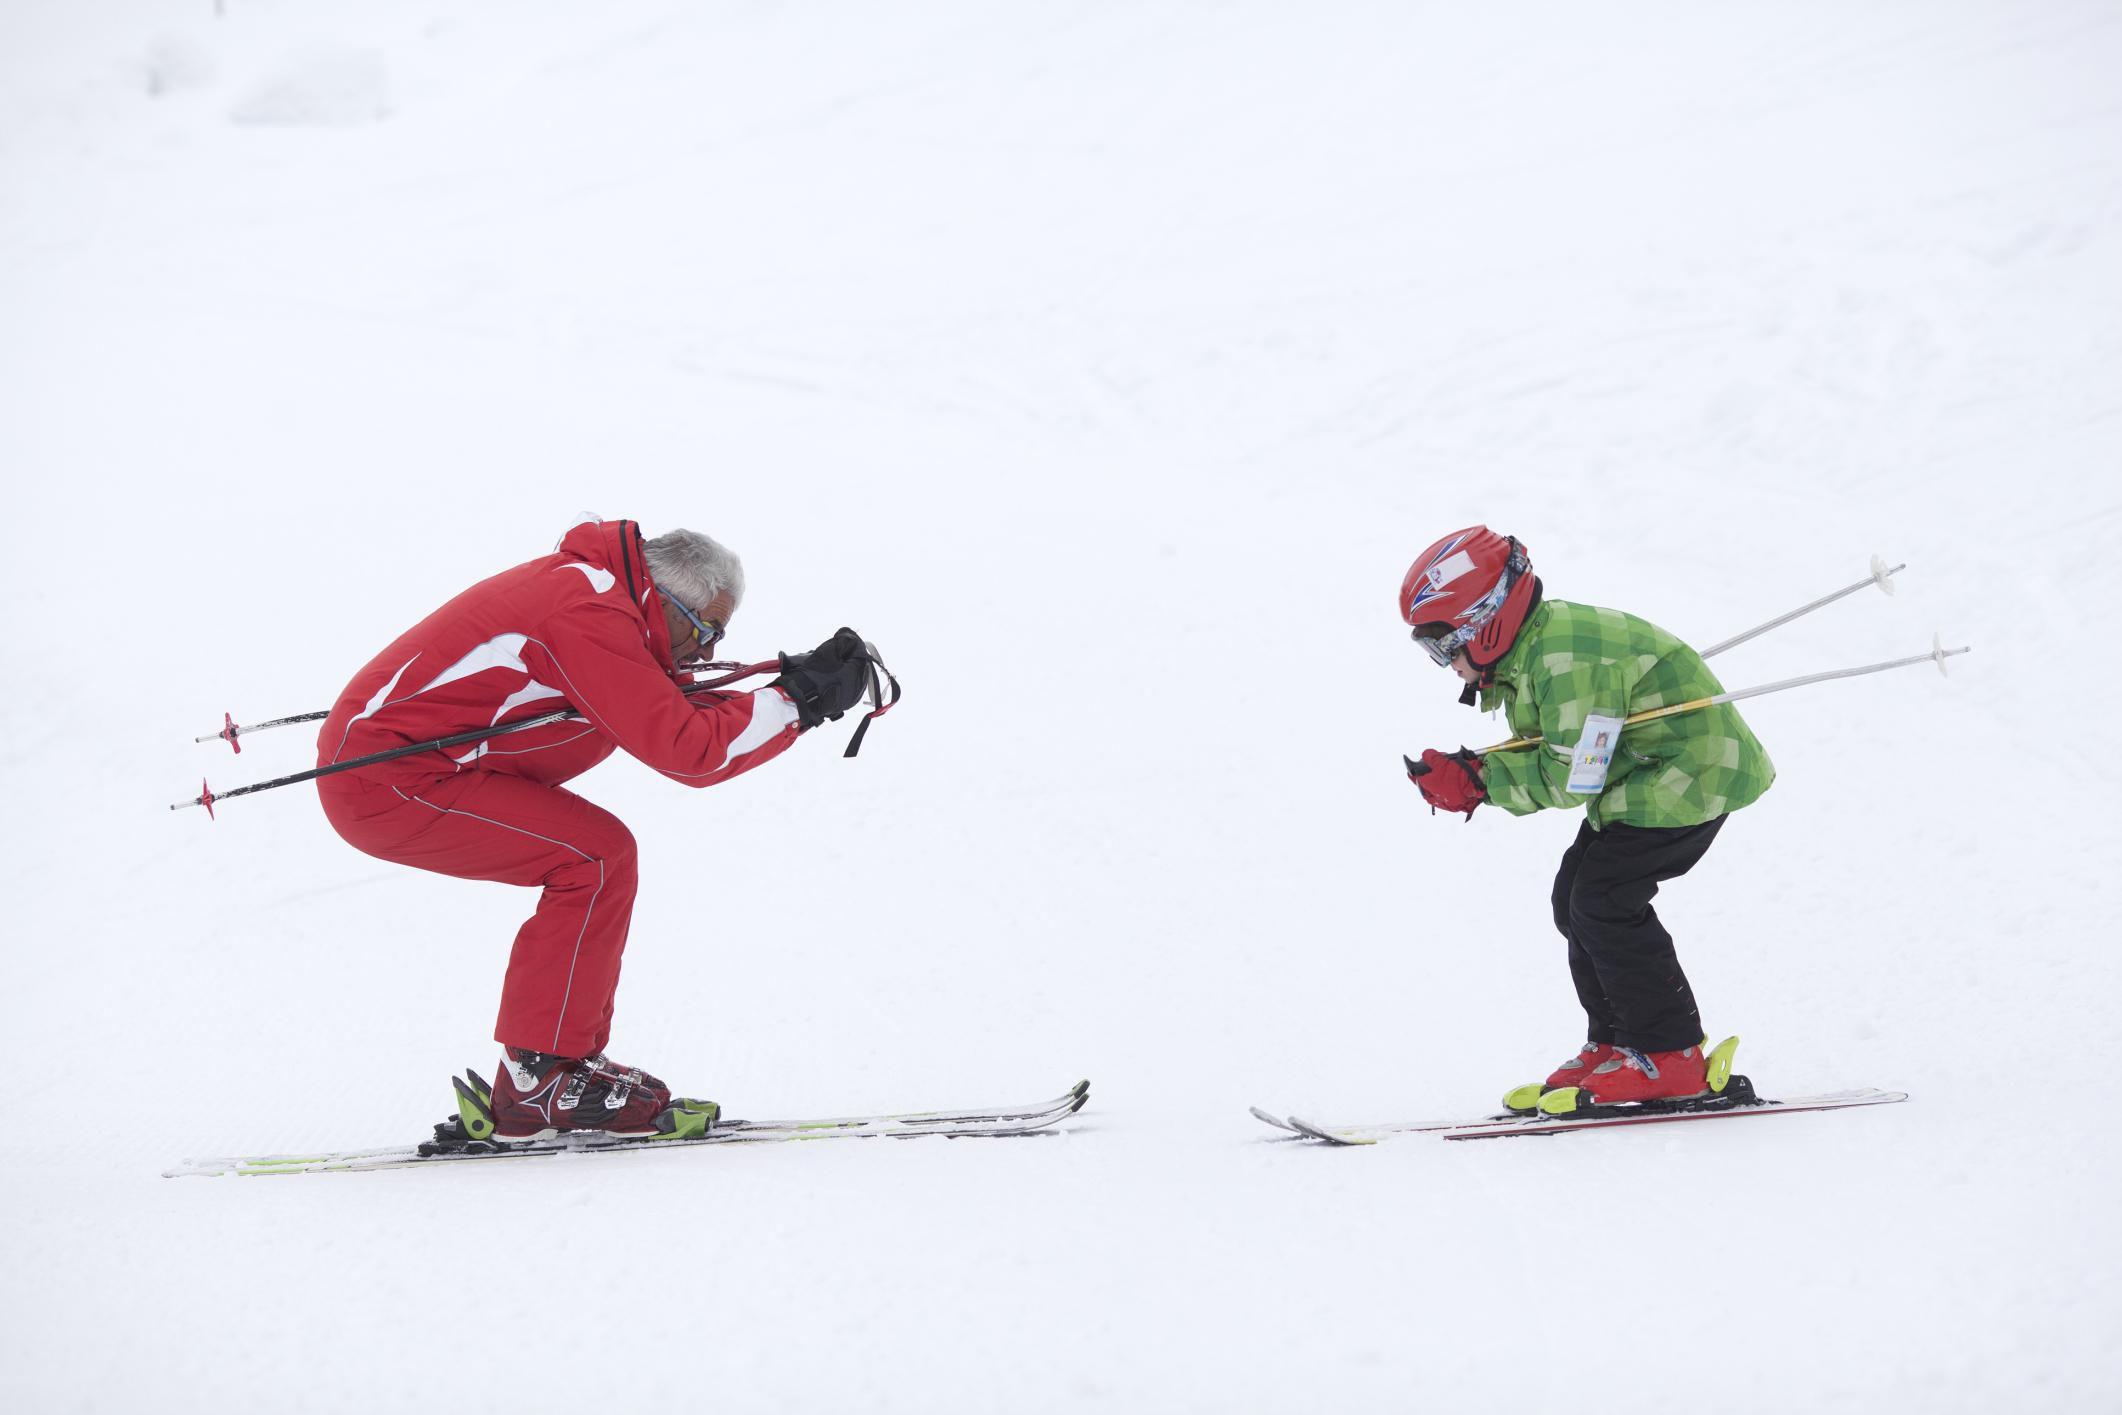 How Much Money Do Ski Instructors Make